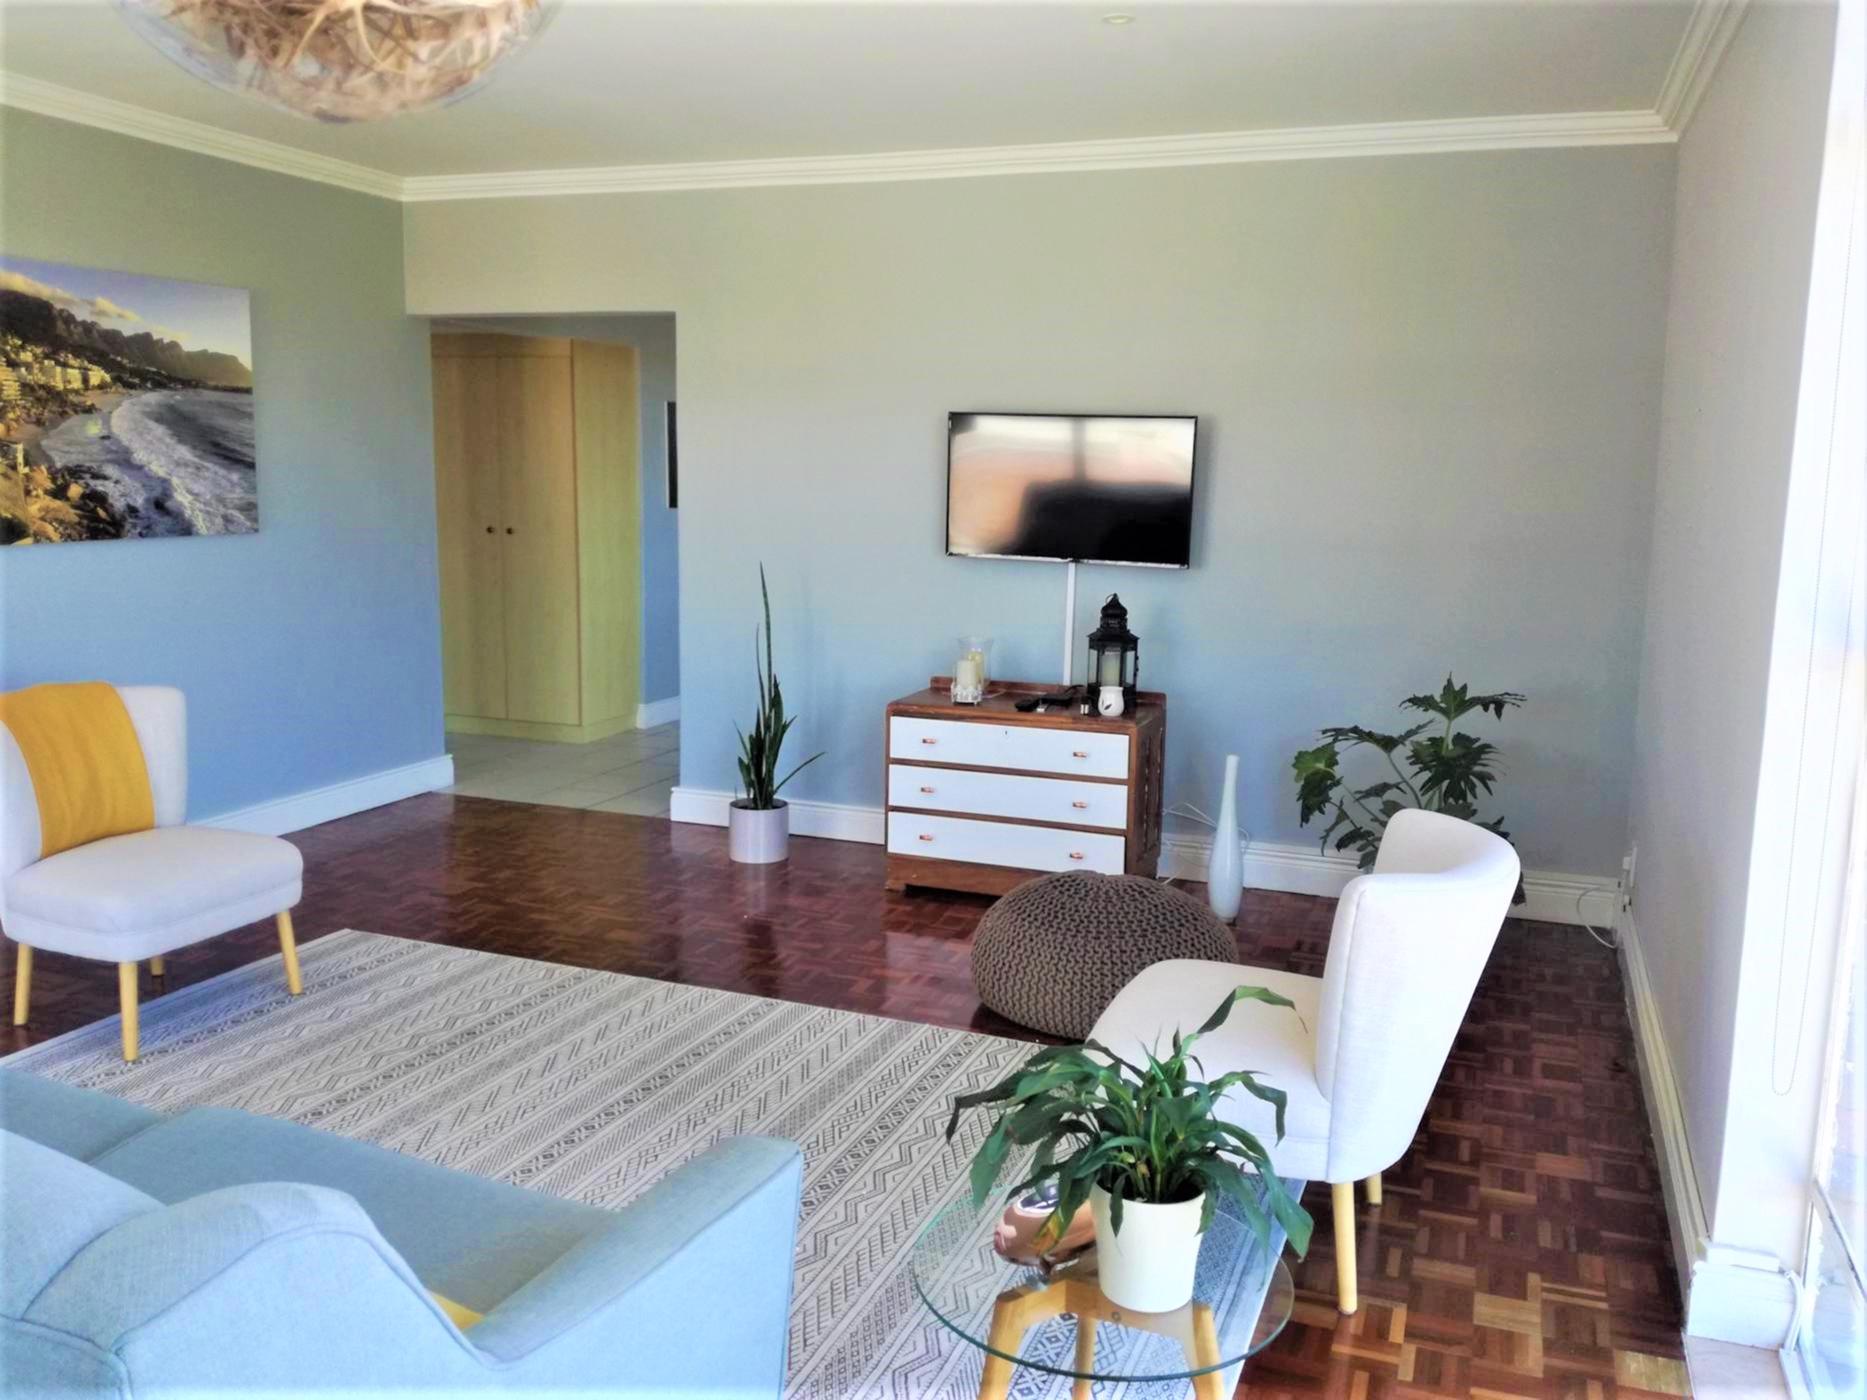 2 bedroom apartment to rent in port elizabeth r12000 per month